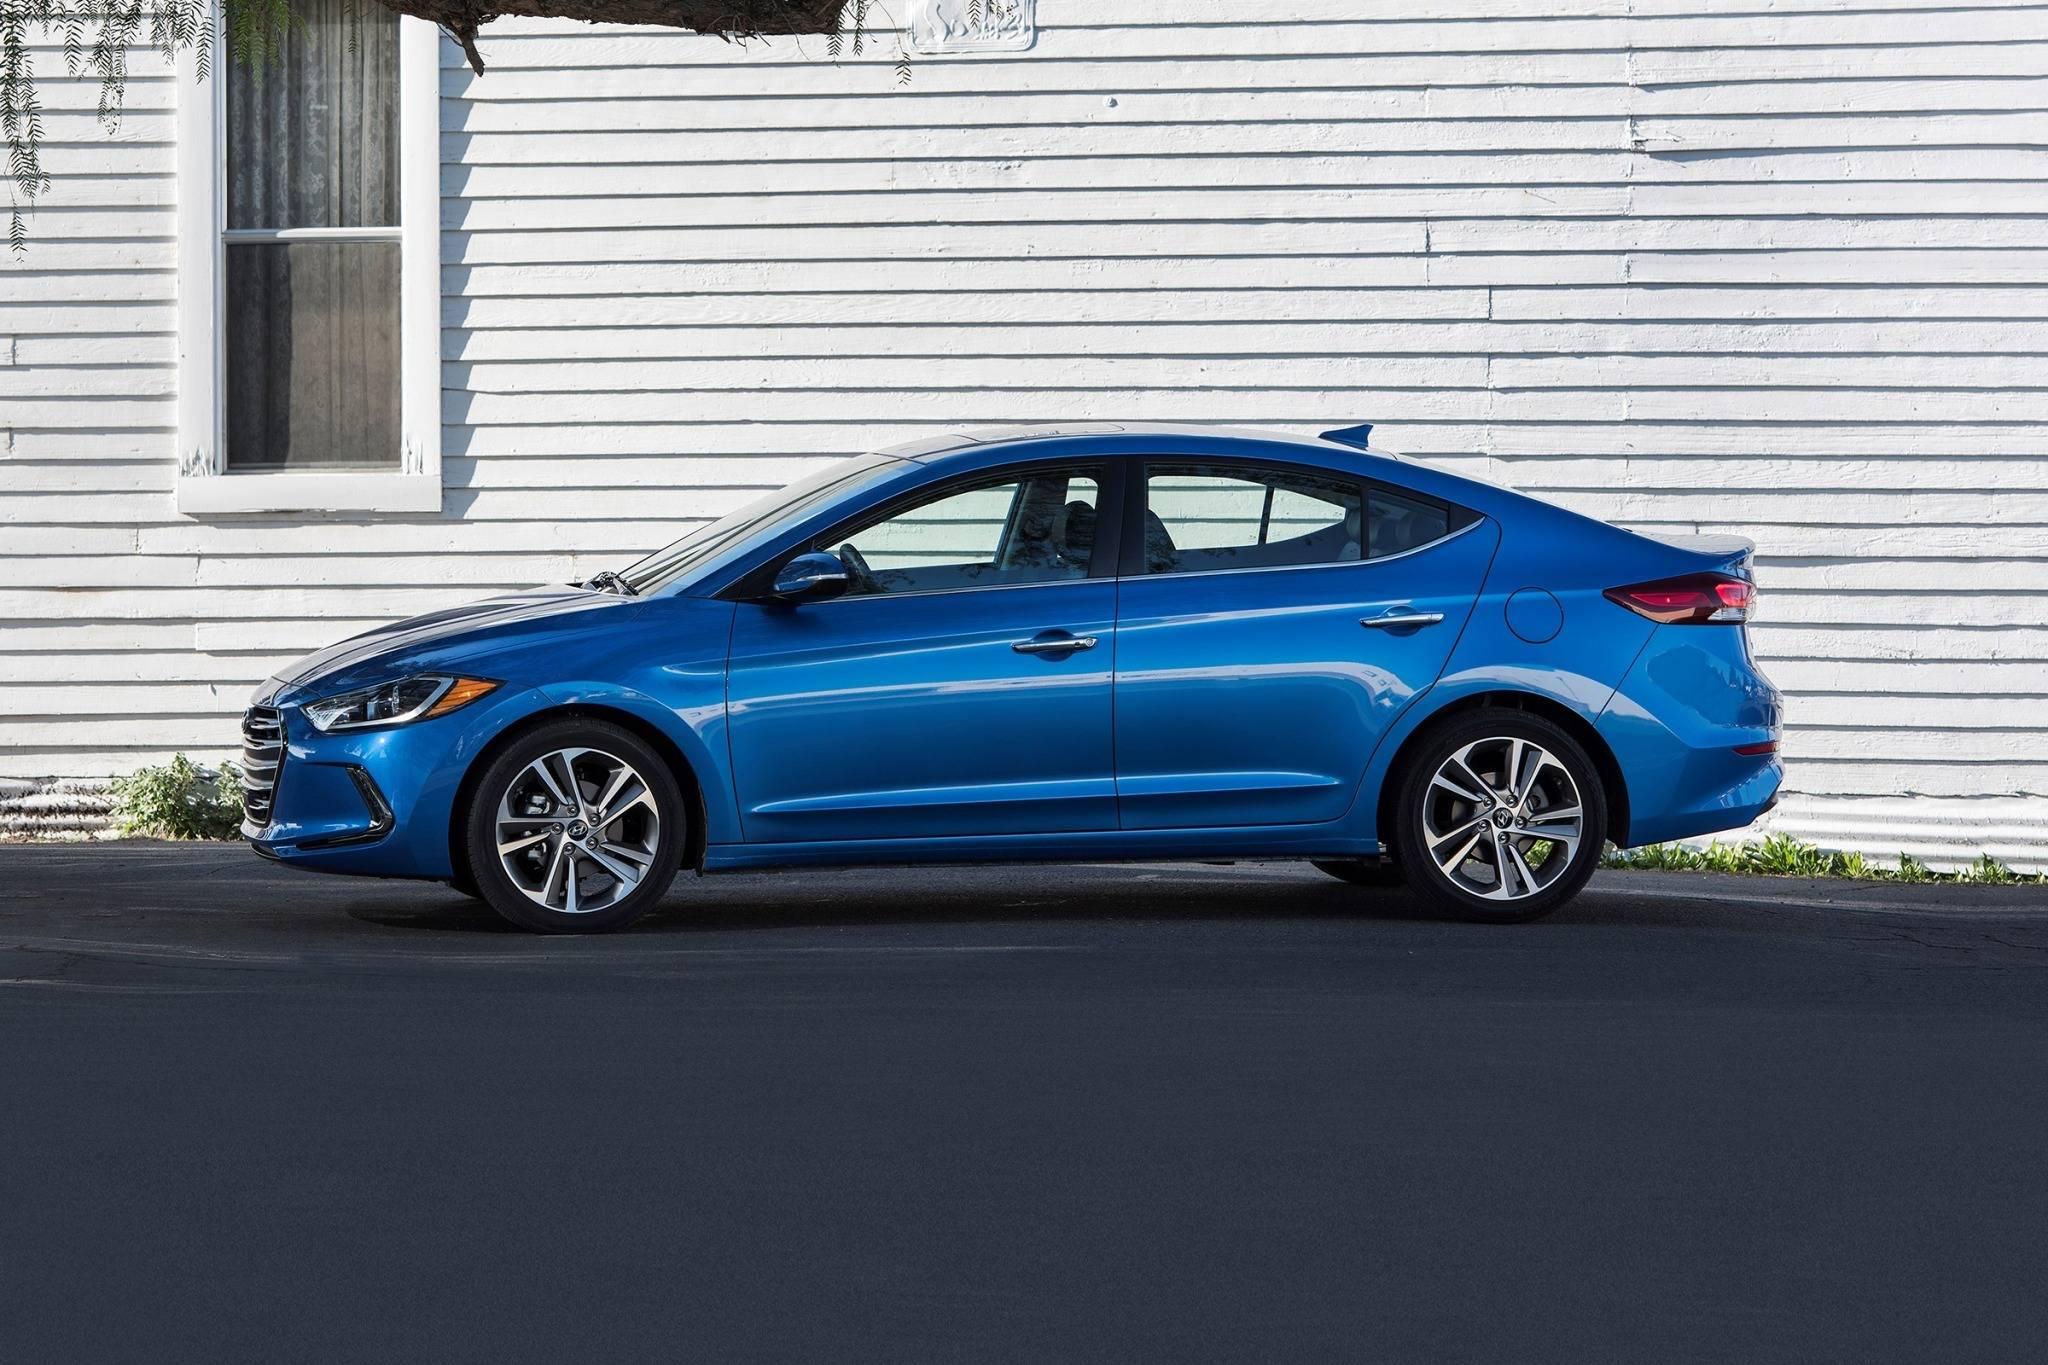 2018 Hyundai Elantra VIN Check. Specs & Recalls - AutoDetective